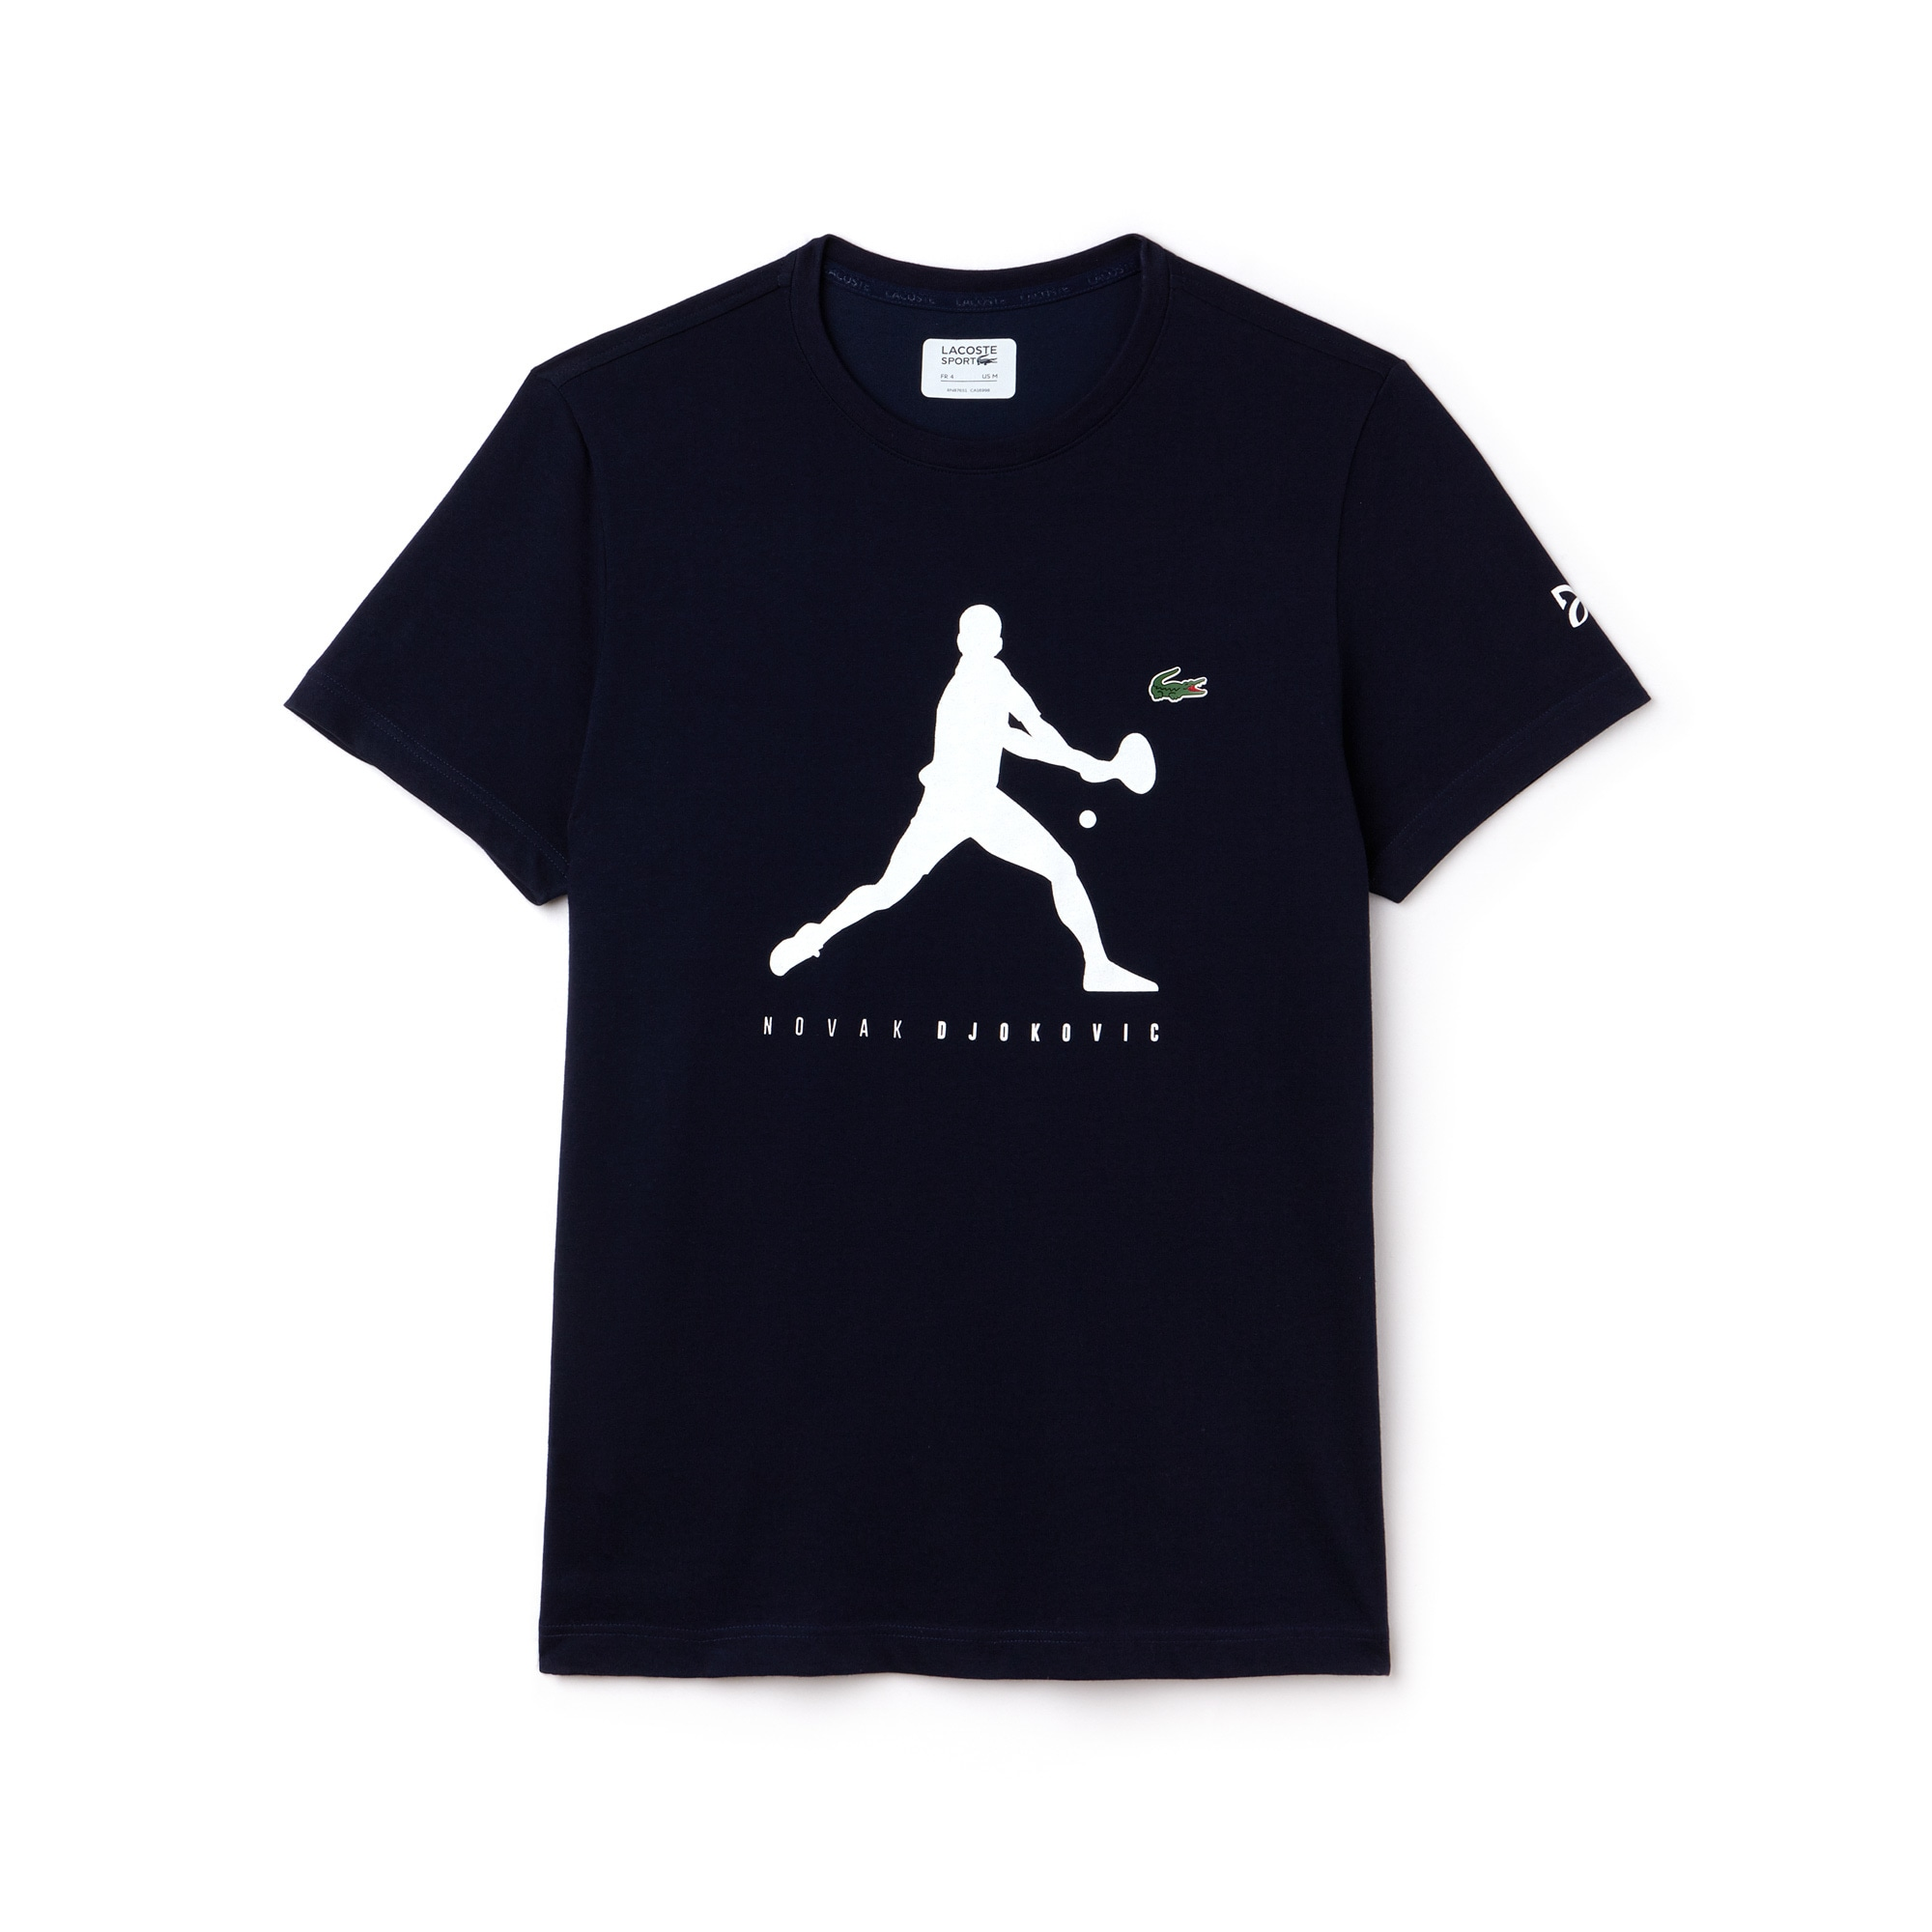 T-shirt a Girocollo In Jersey Tinta Unita Con Stampato - Collezione Support With Style